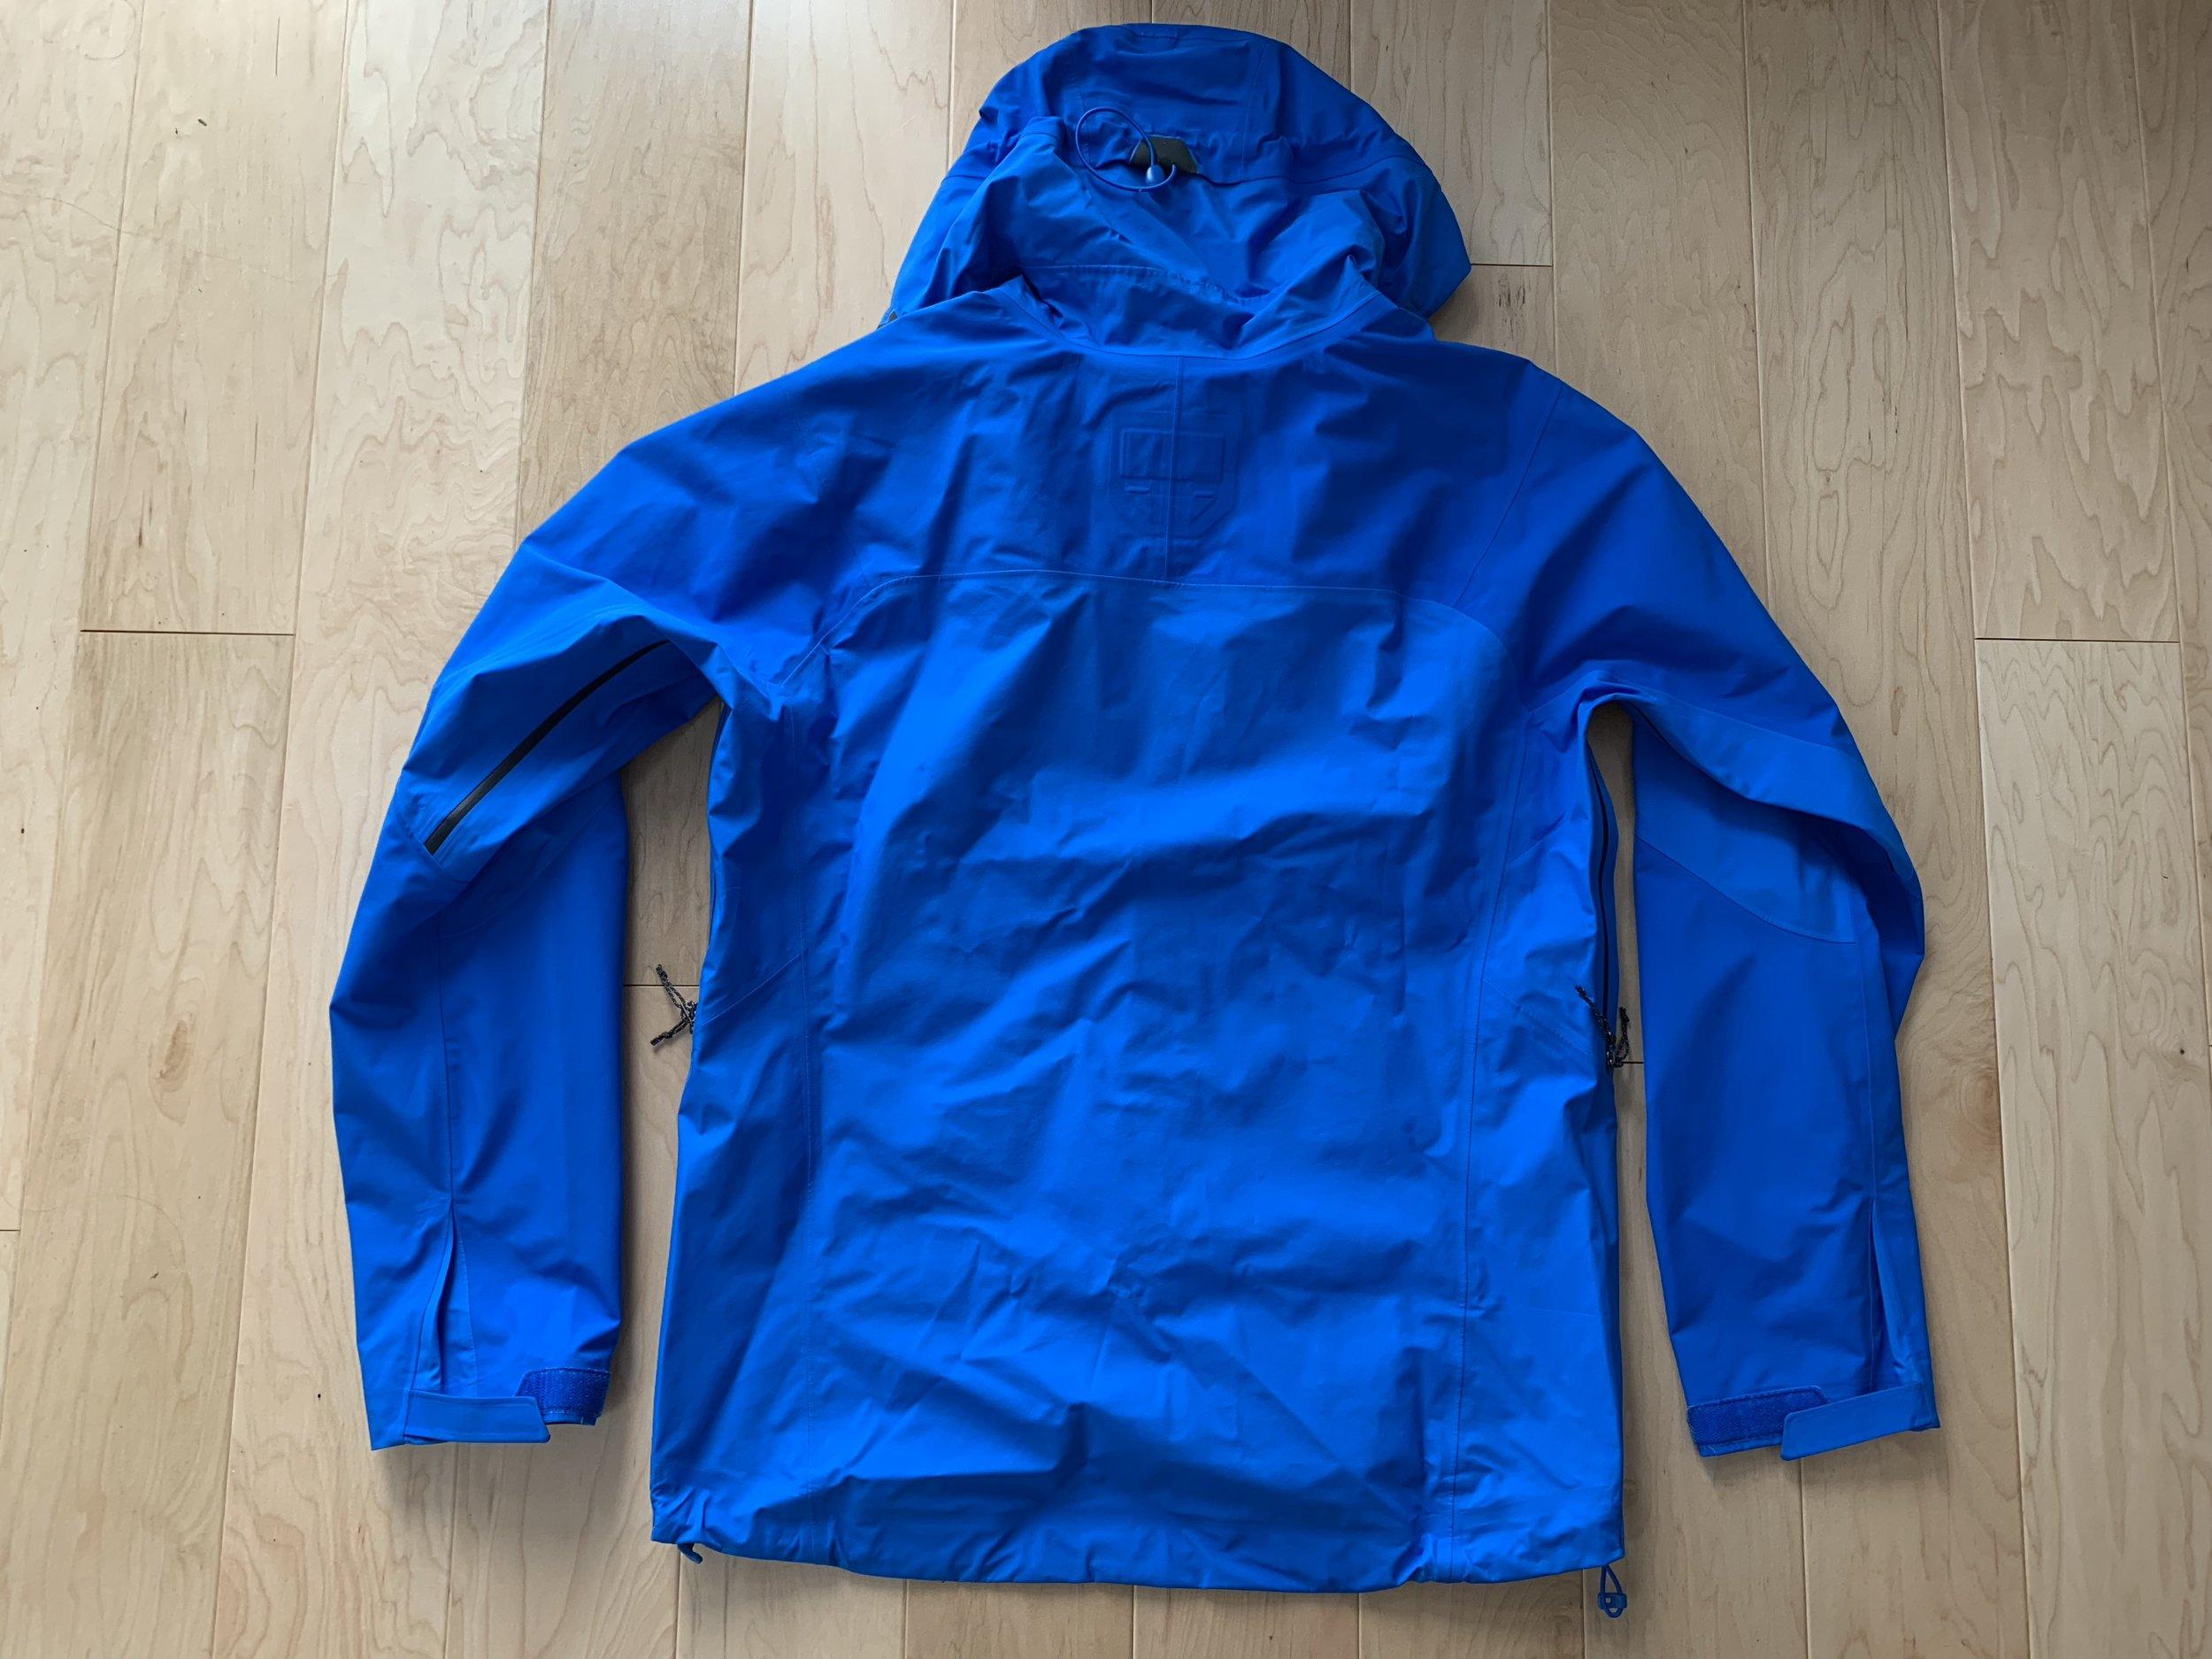 Patagonia Triolet Jacket Review